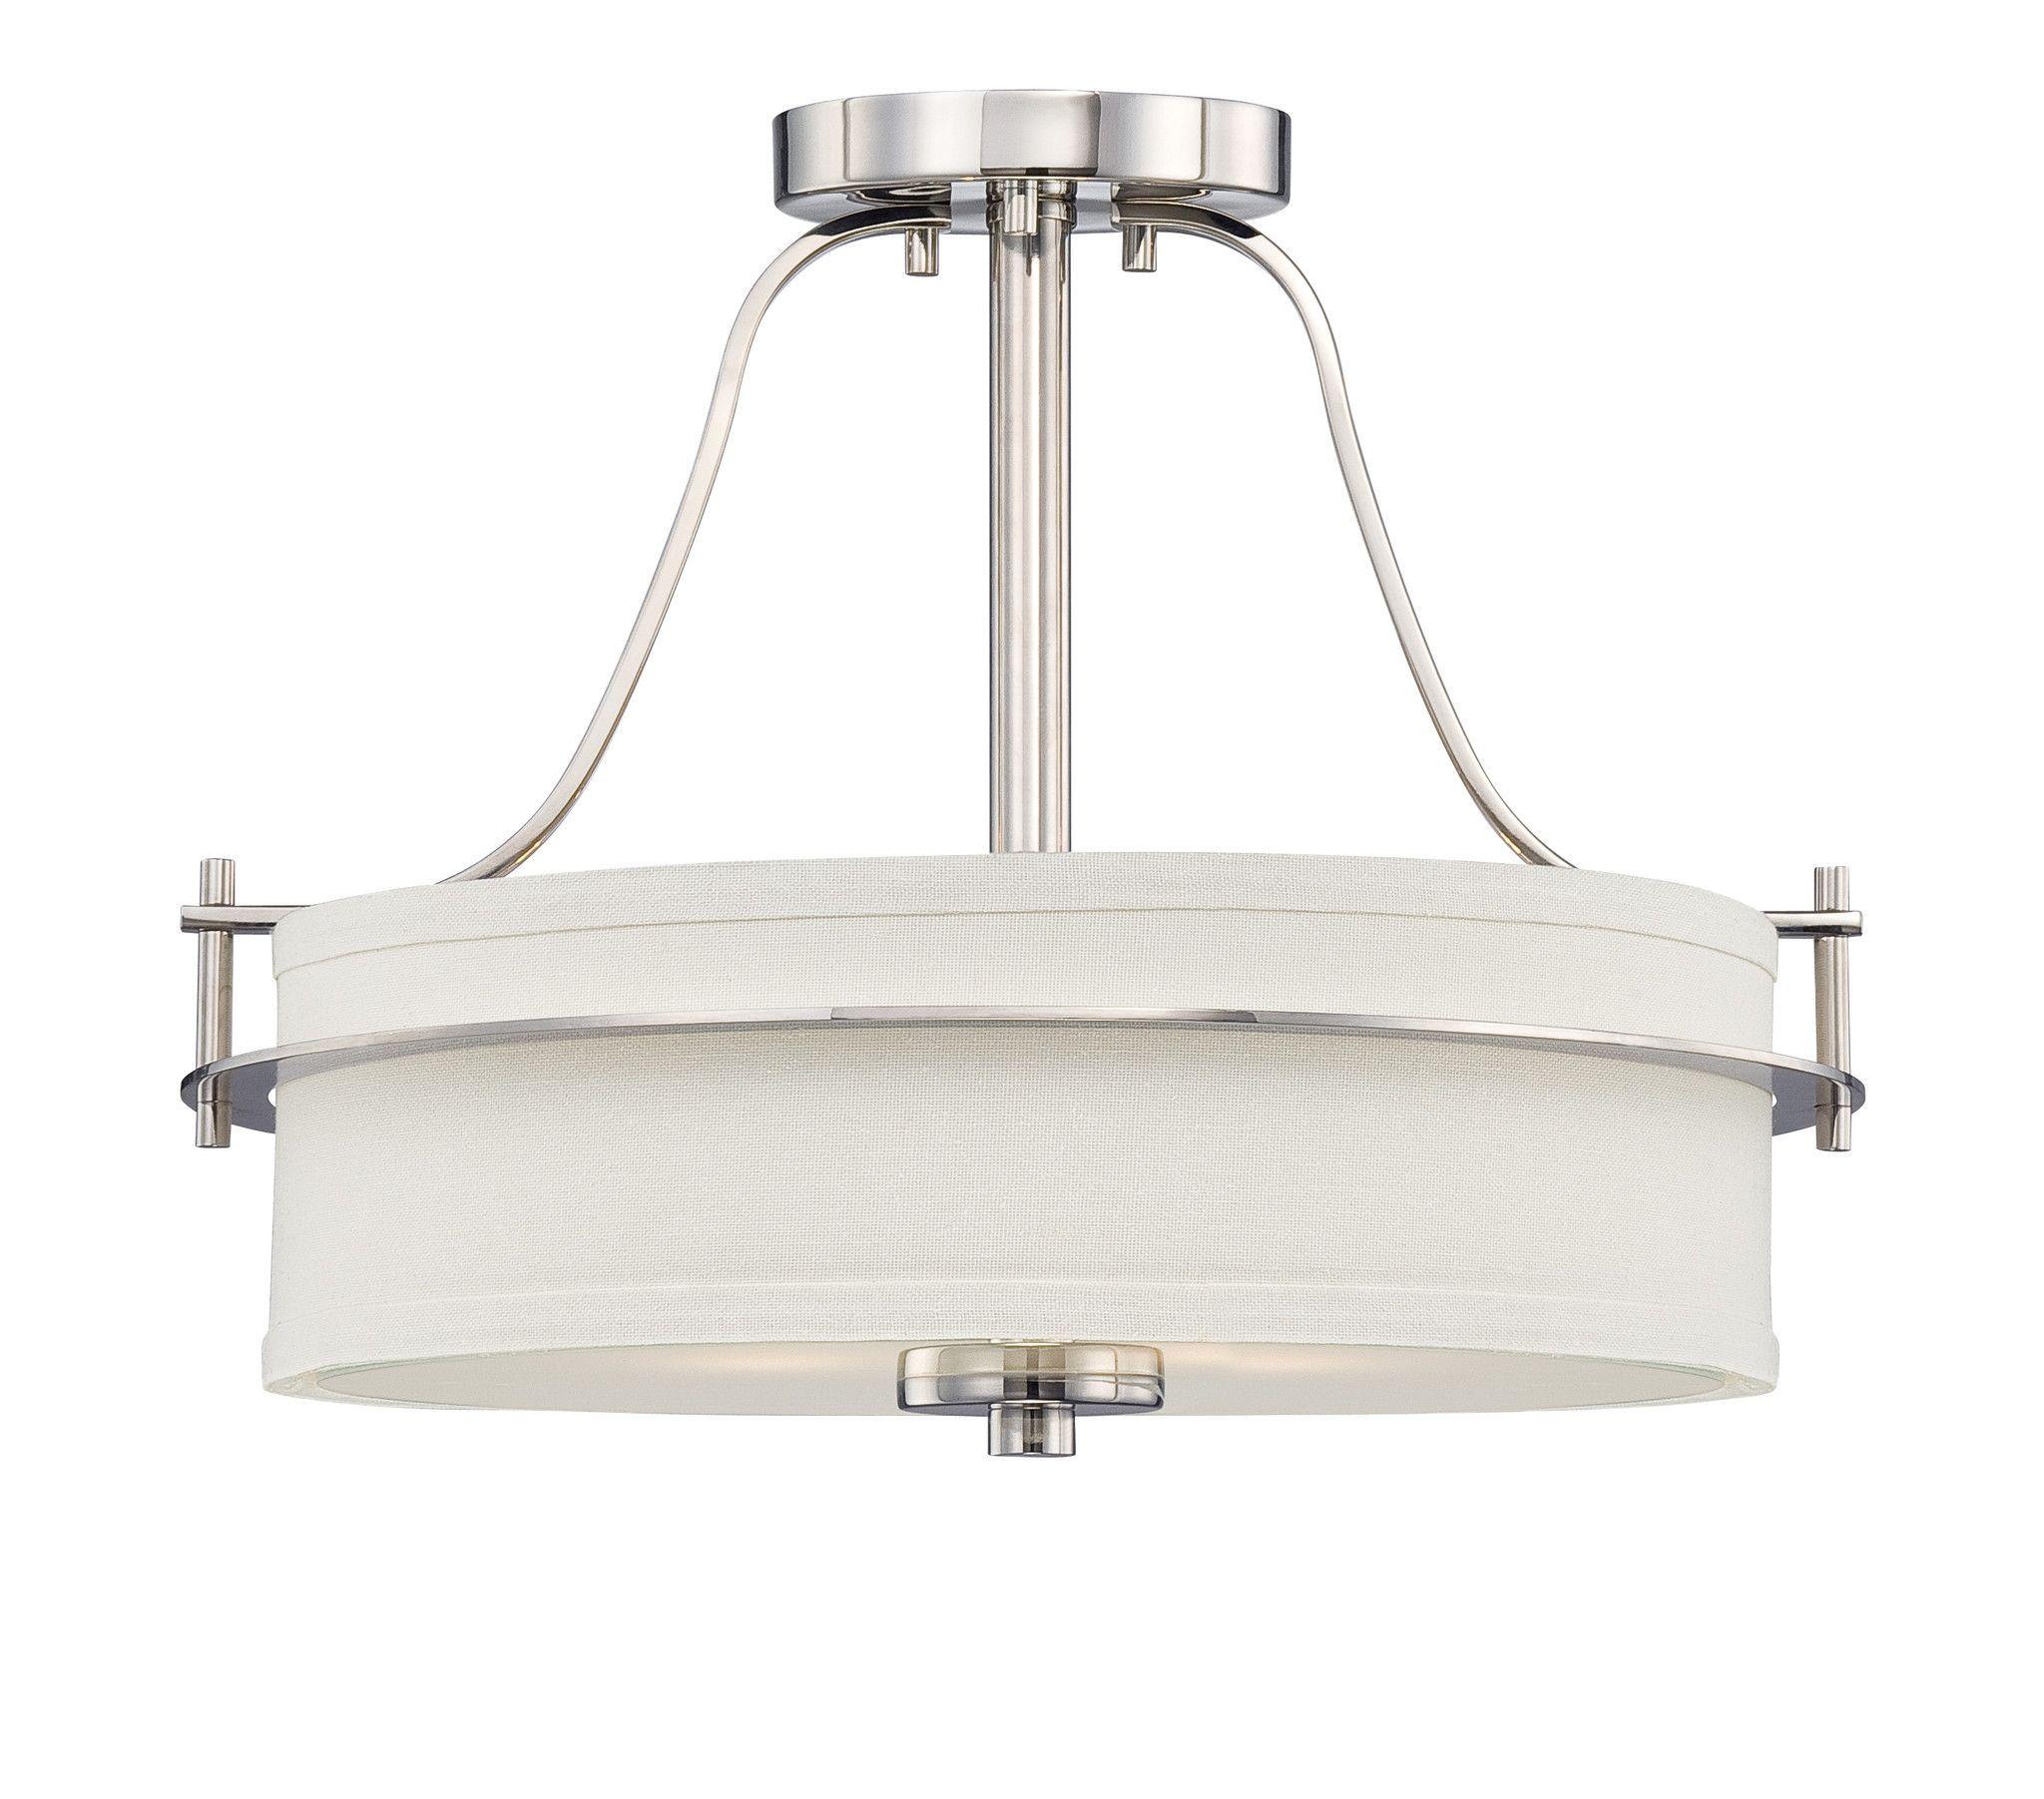 Loren - 2 Light Semi Flush w/ White Linen Shade